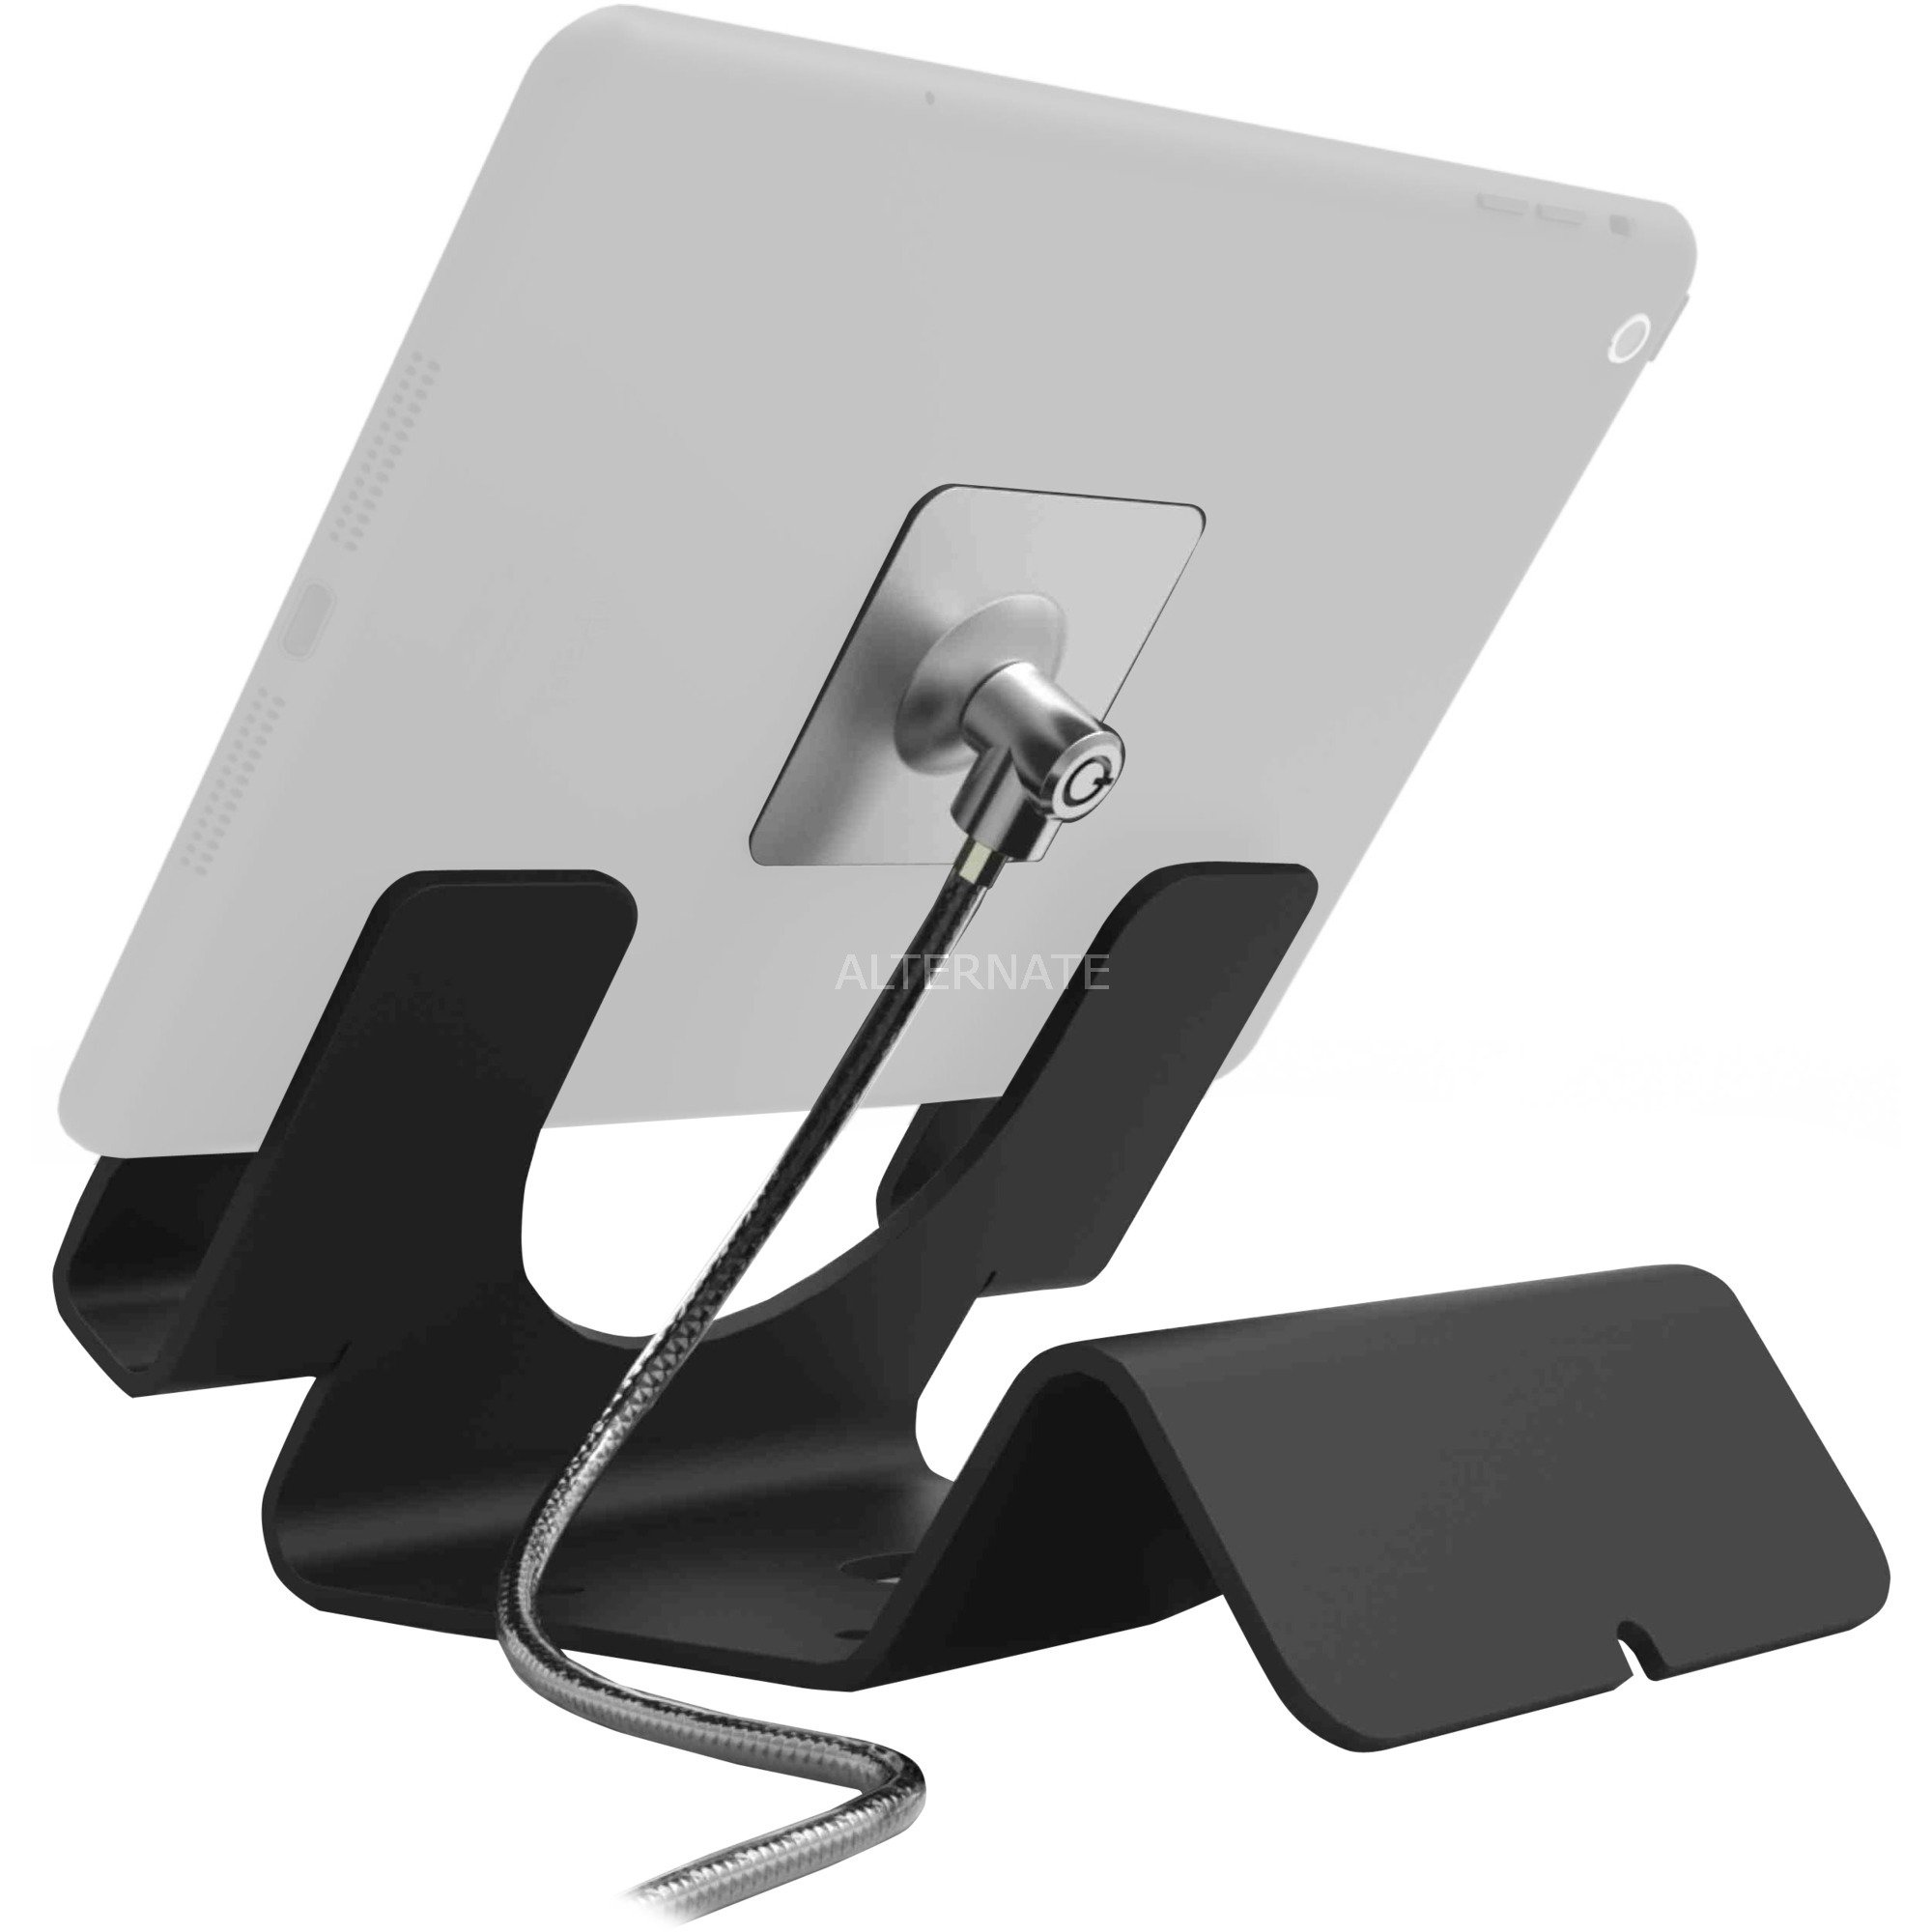 Universal Tablet Security Holder Tablet/UMPC Negro, Seguridad